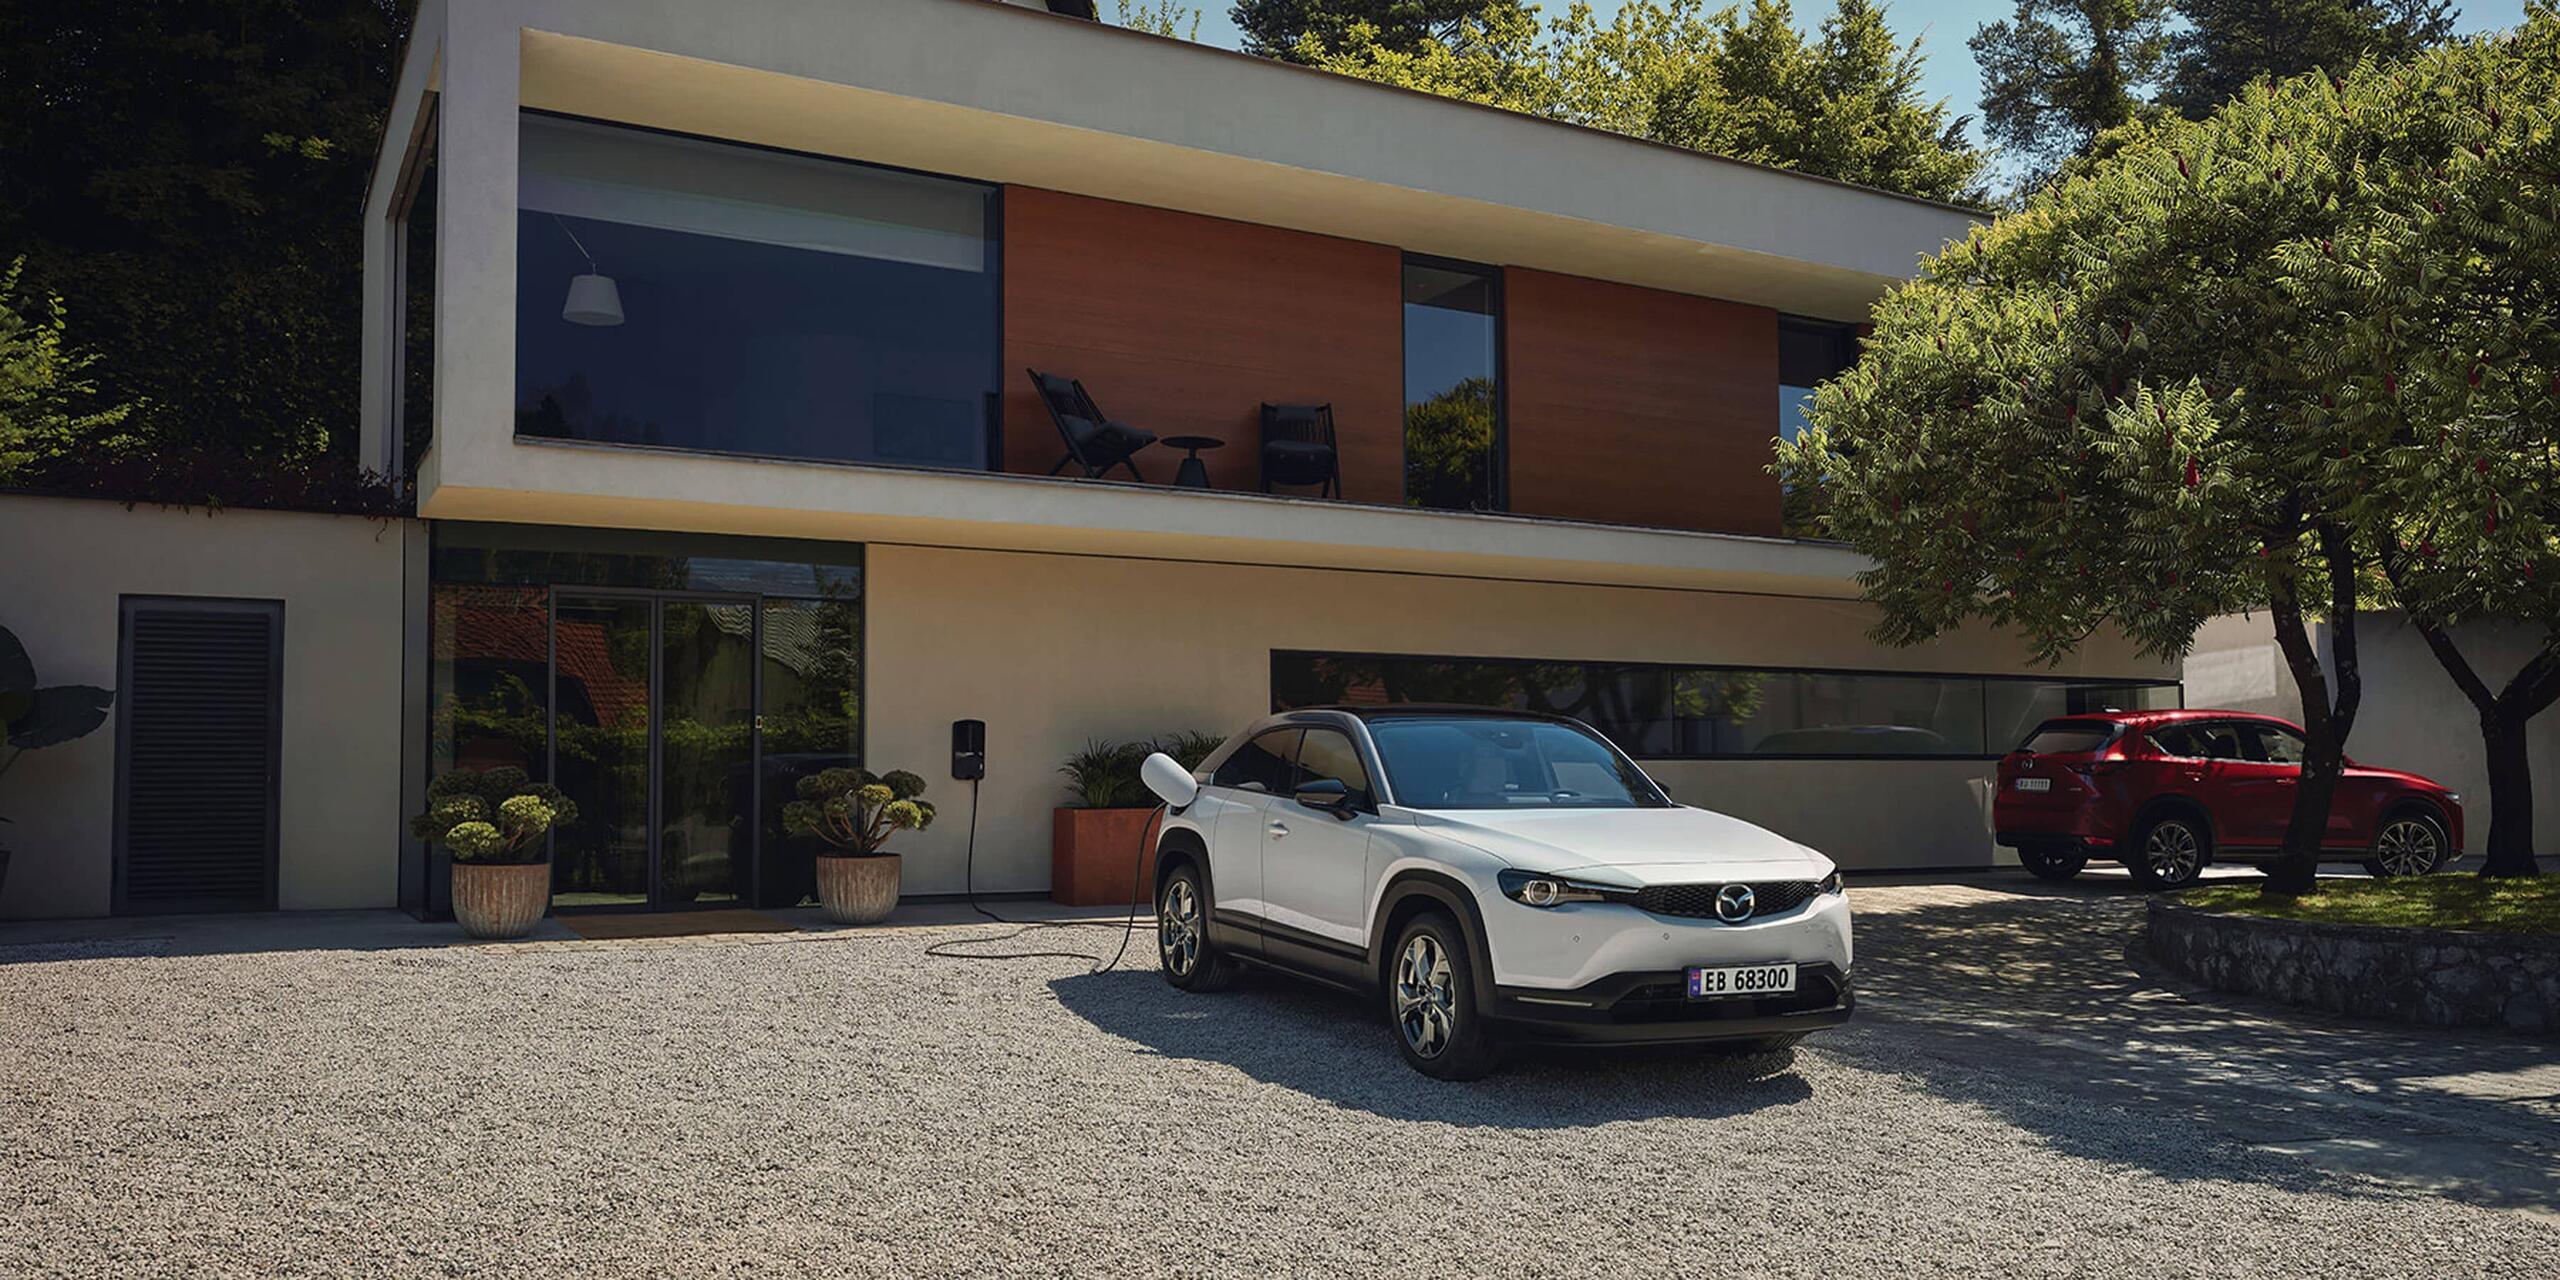 Mazda MX-30 tilkoblet lader på gårdsplassen foran et funkishus